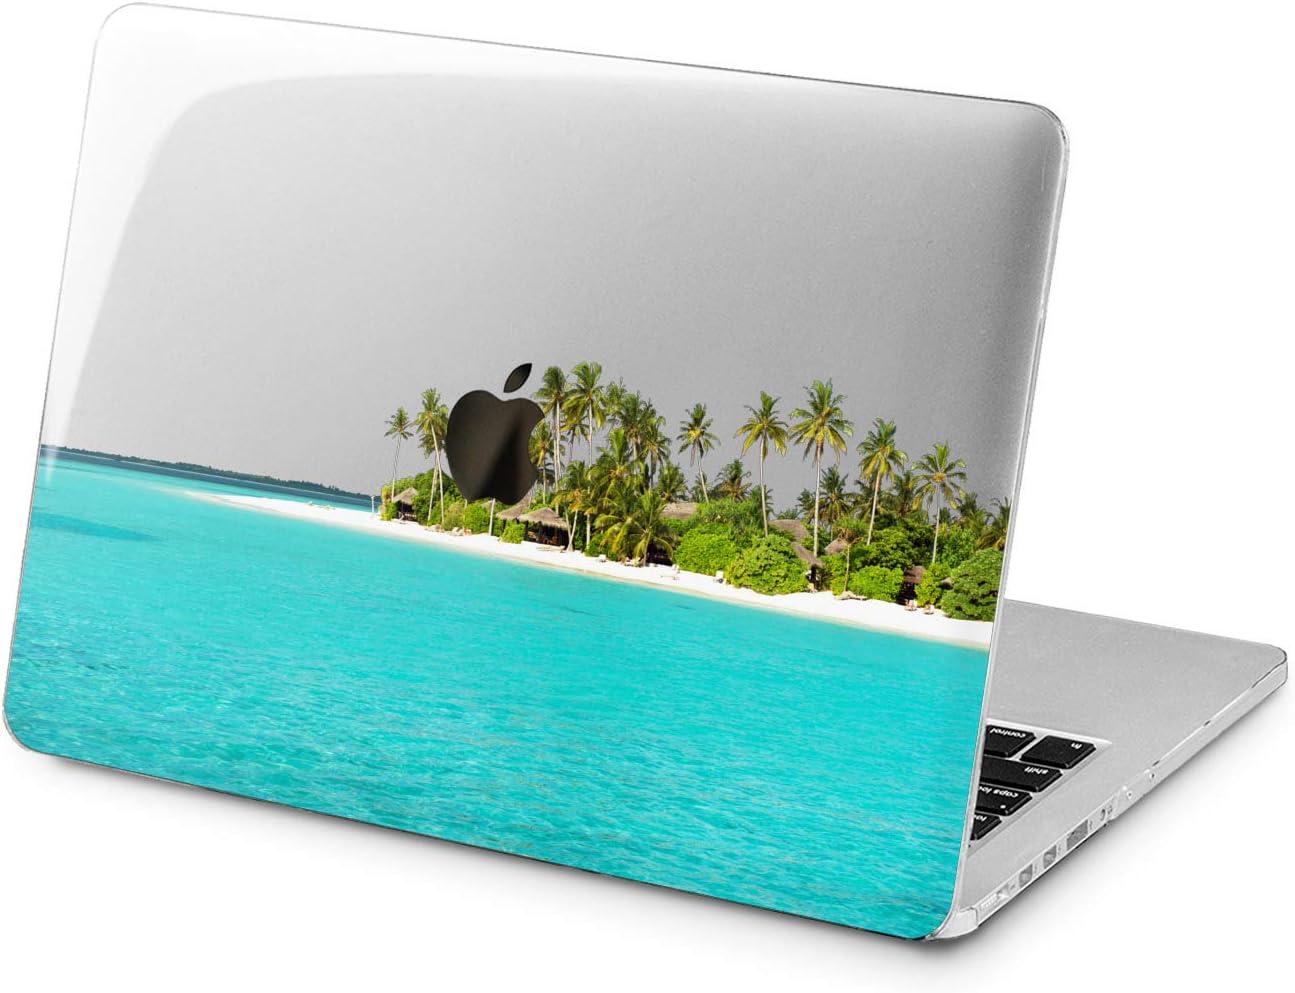 "Cavka Hard Shell Case for Apple MacBook Pro 13"" 2019 15"" 2018 Air 13"" 2020 Retina 2015 Mac 11"" Mac 12"" Tropical Beautiful Green Palms Cover Beach Design Blue Ocean Plastic Laptop Protective Print"